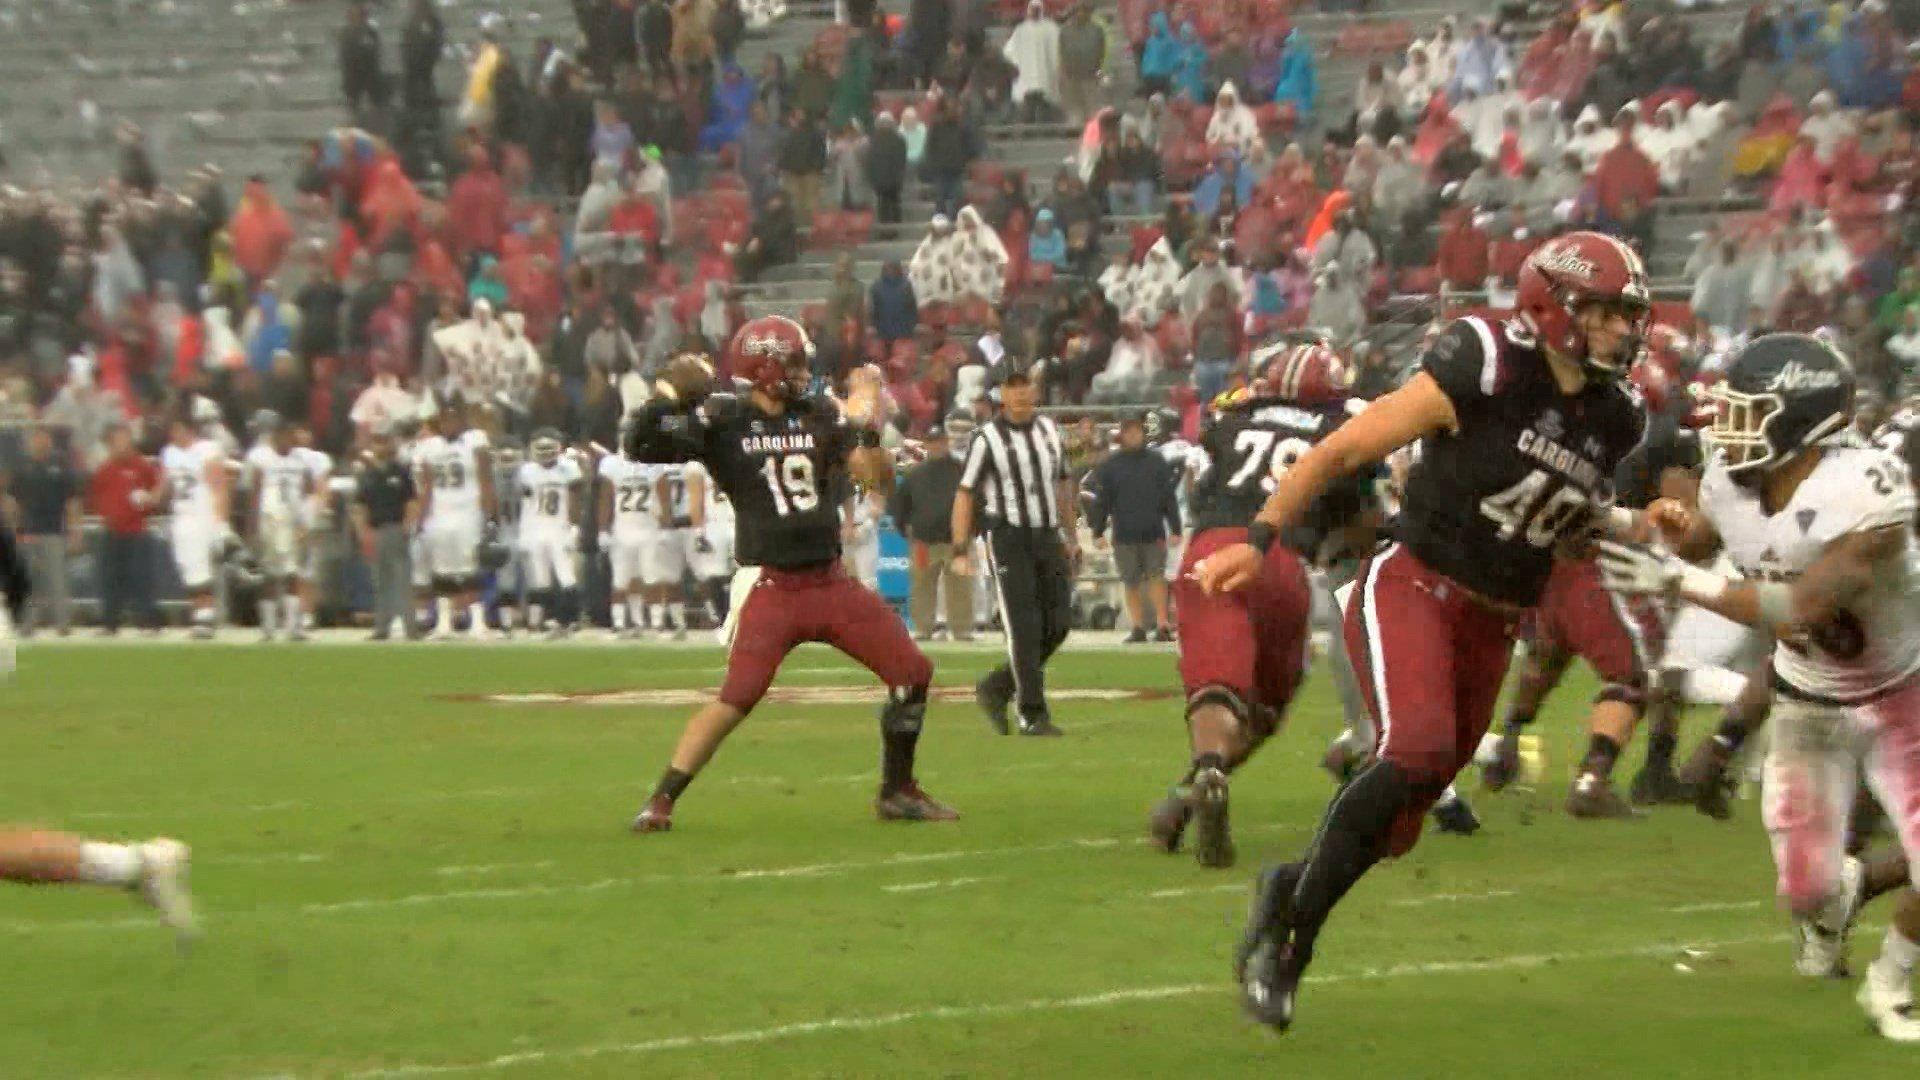 Quarterback Jake Bentley